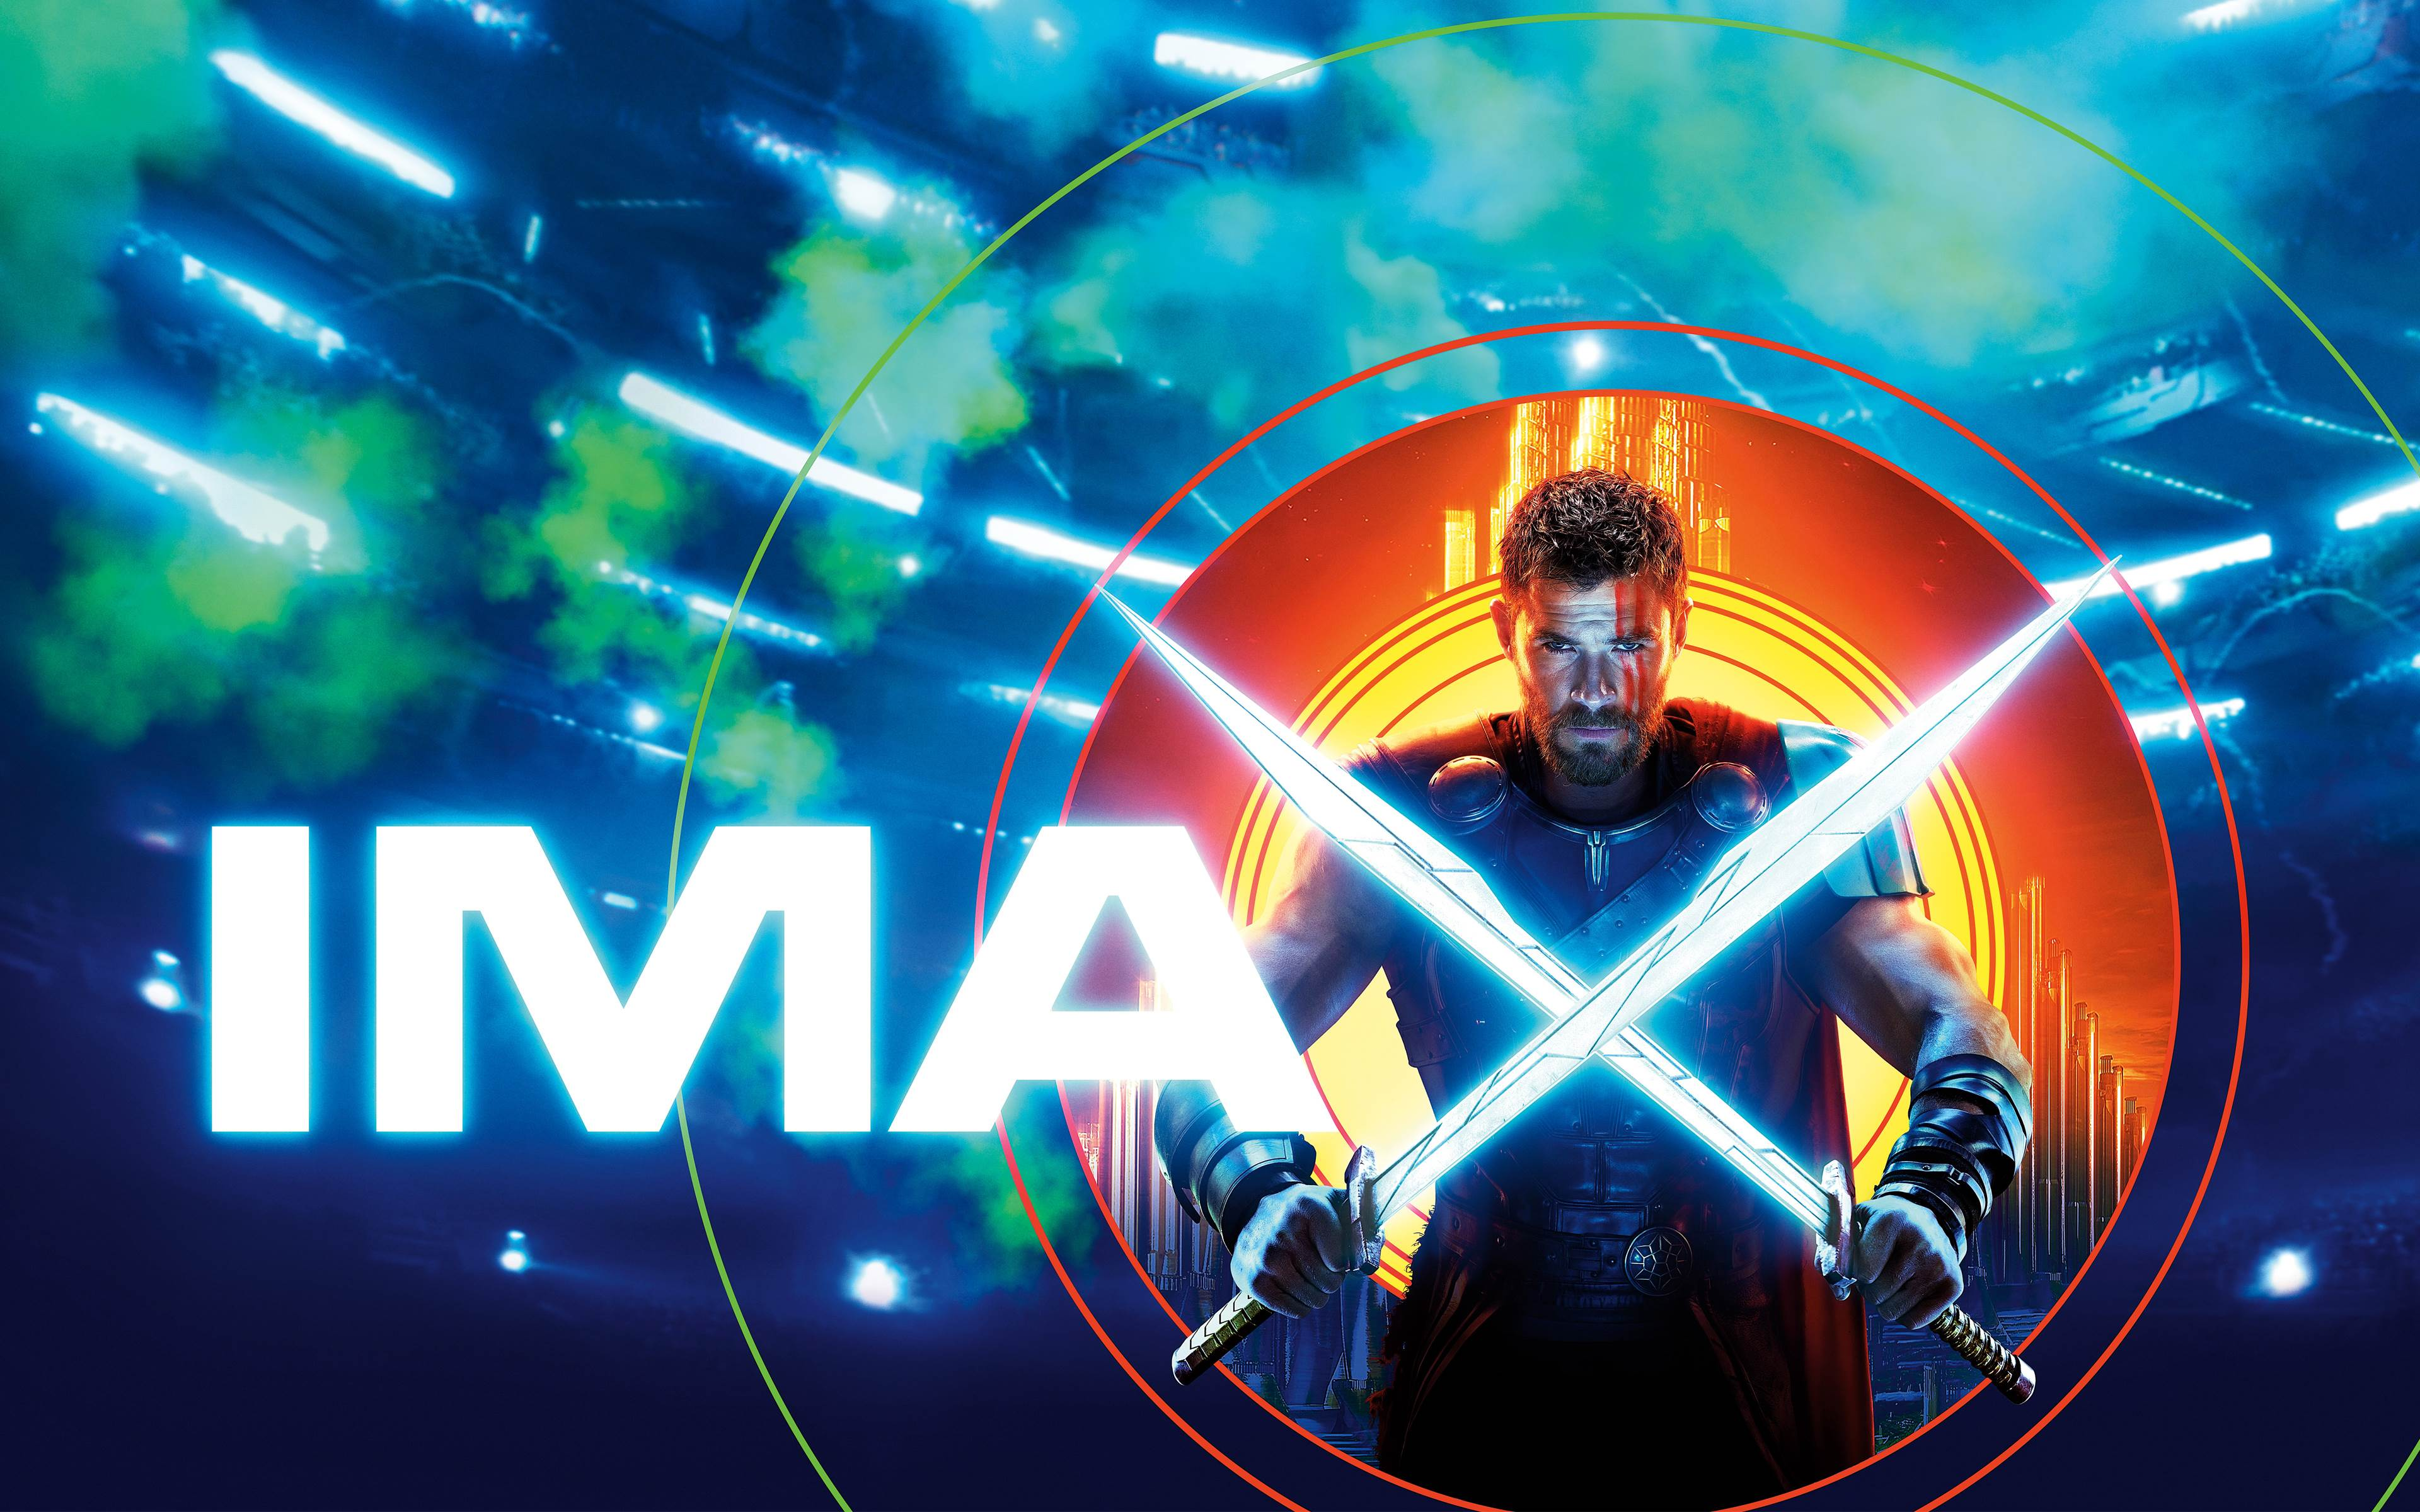 Thor: Ragnarok IMAX 4k Wallpaper